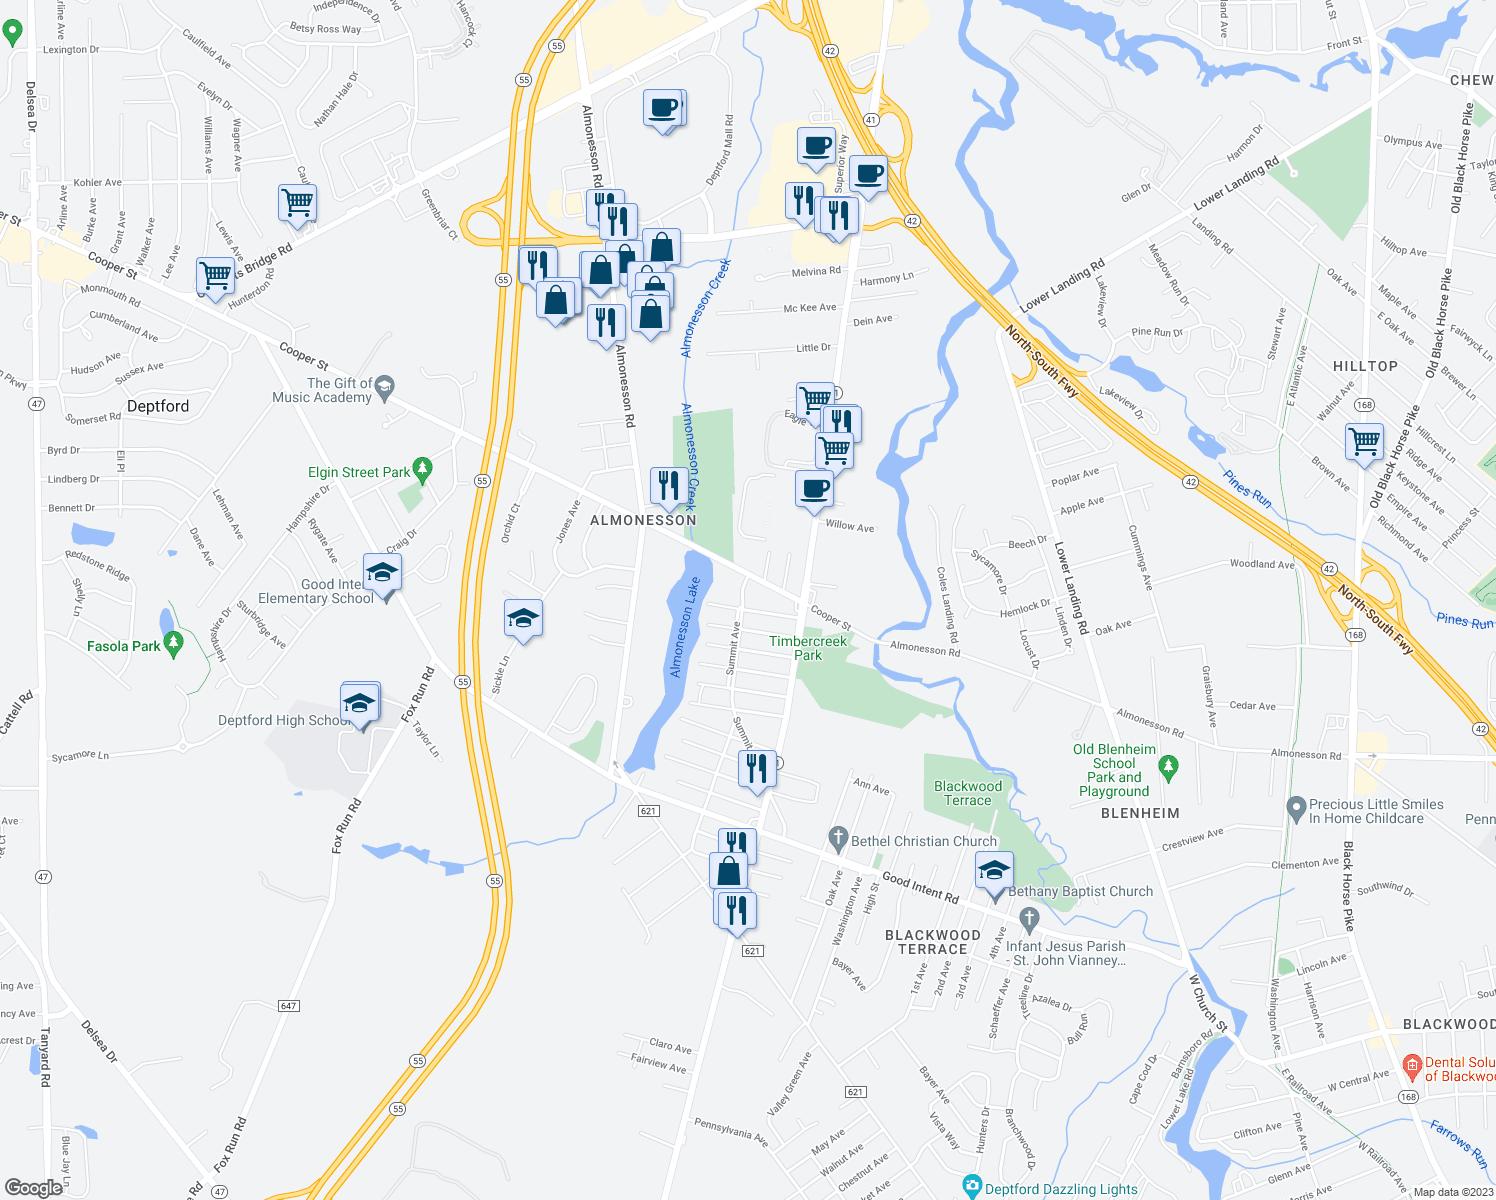 Restaurants Near Me 08096